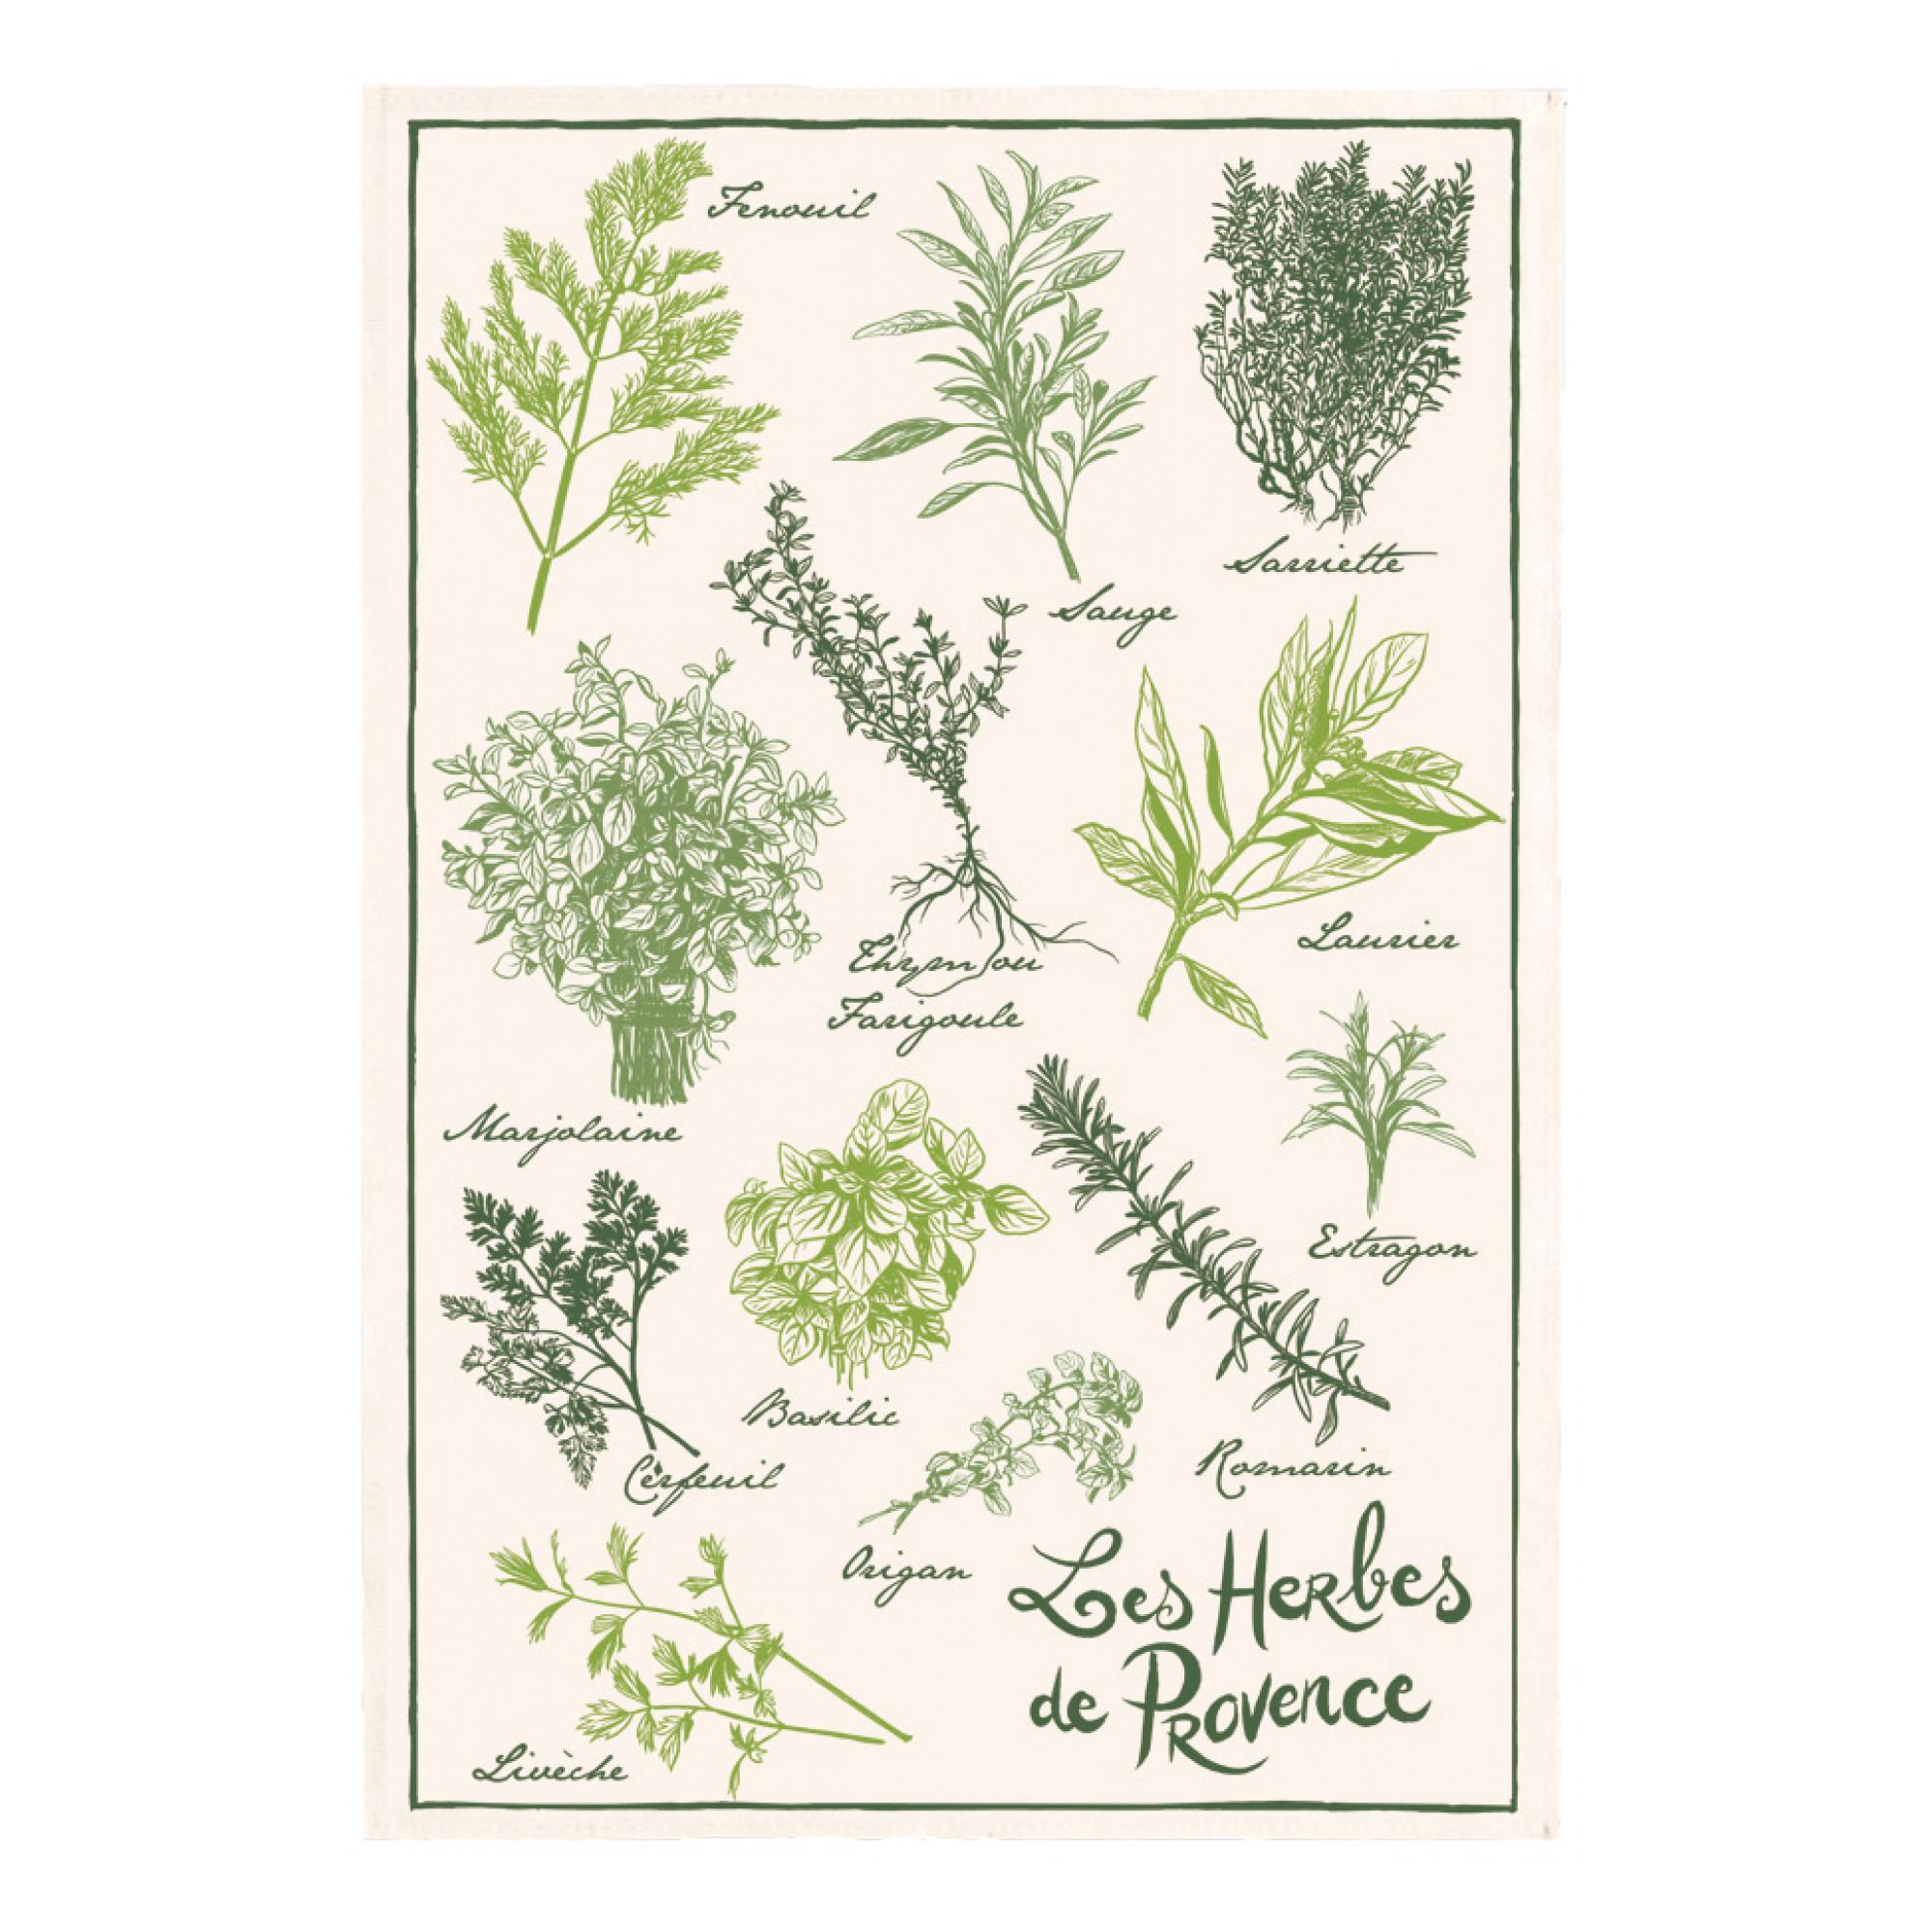 Torchon les herbes de provence en coton ecru 48 x 72